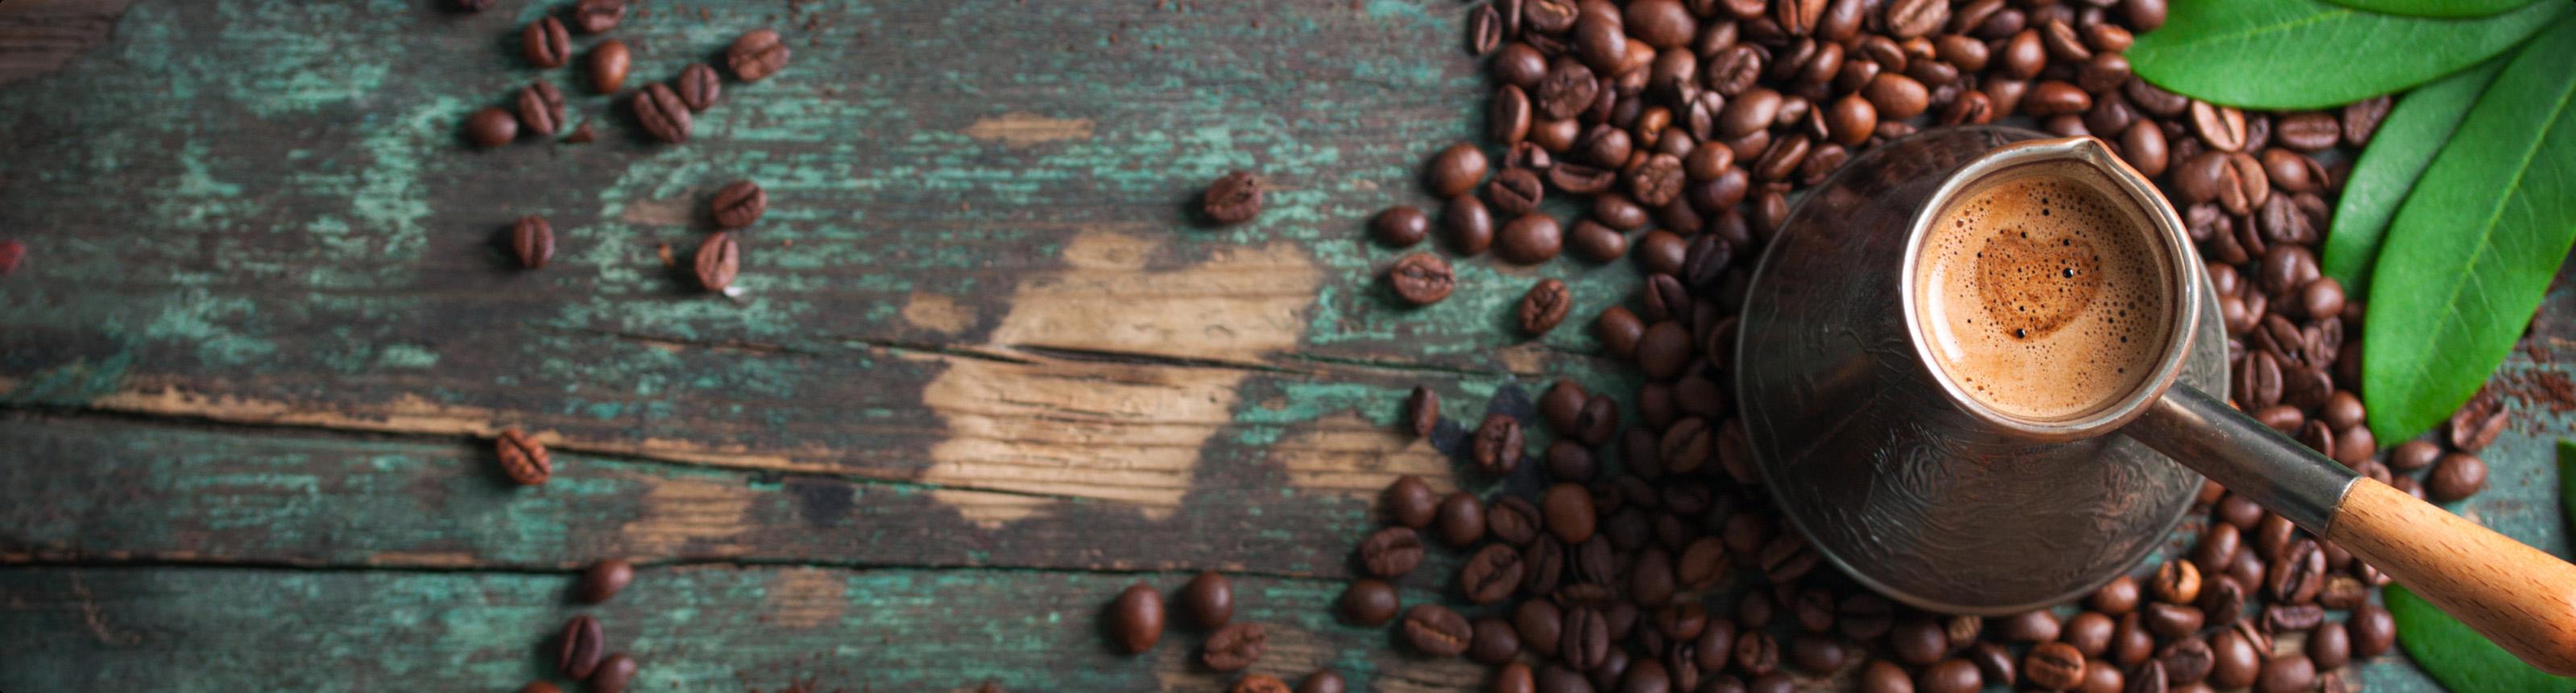 Кофе для турки